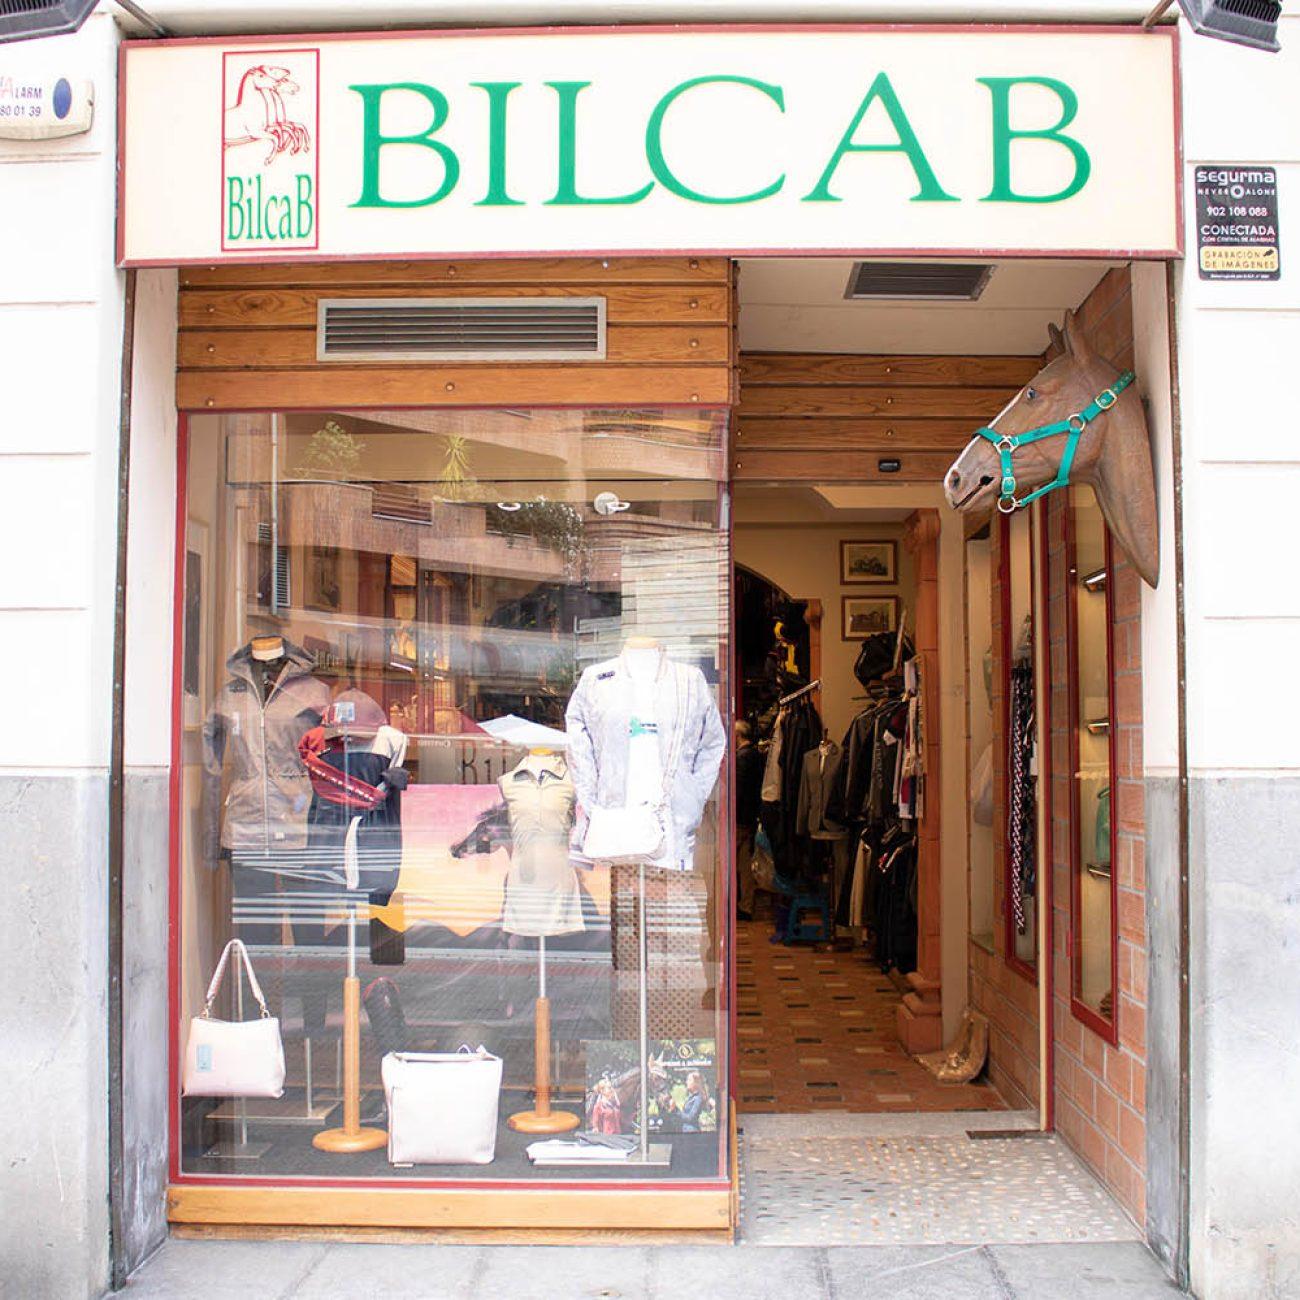 BILCAB